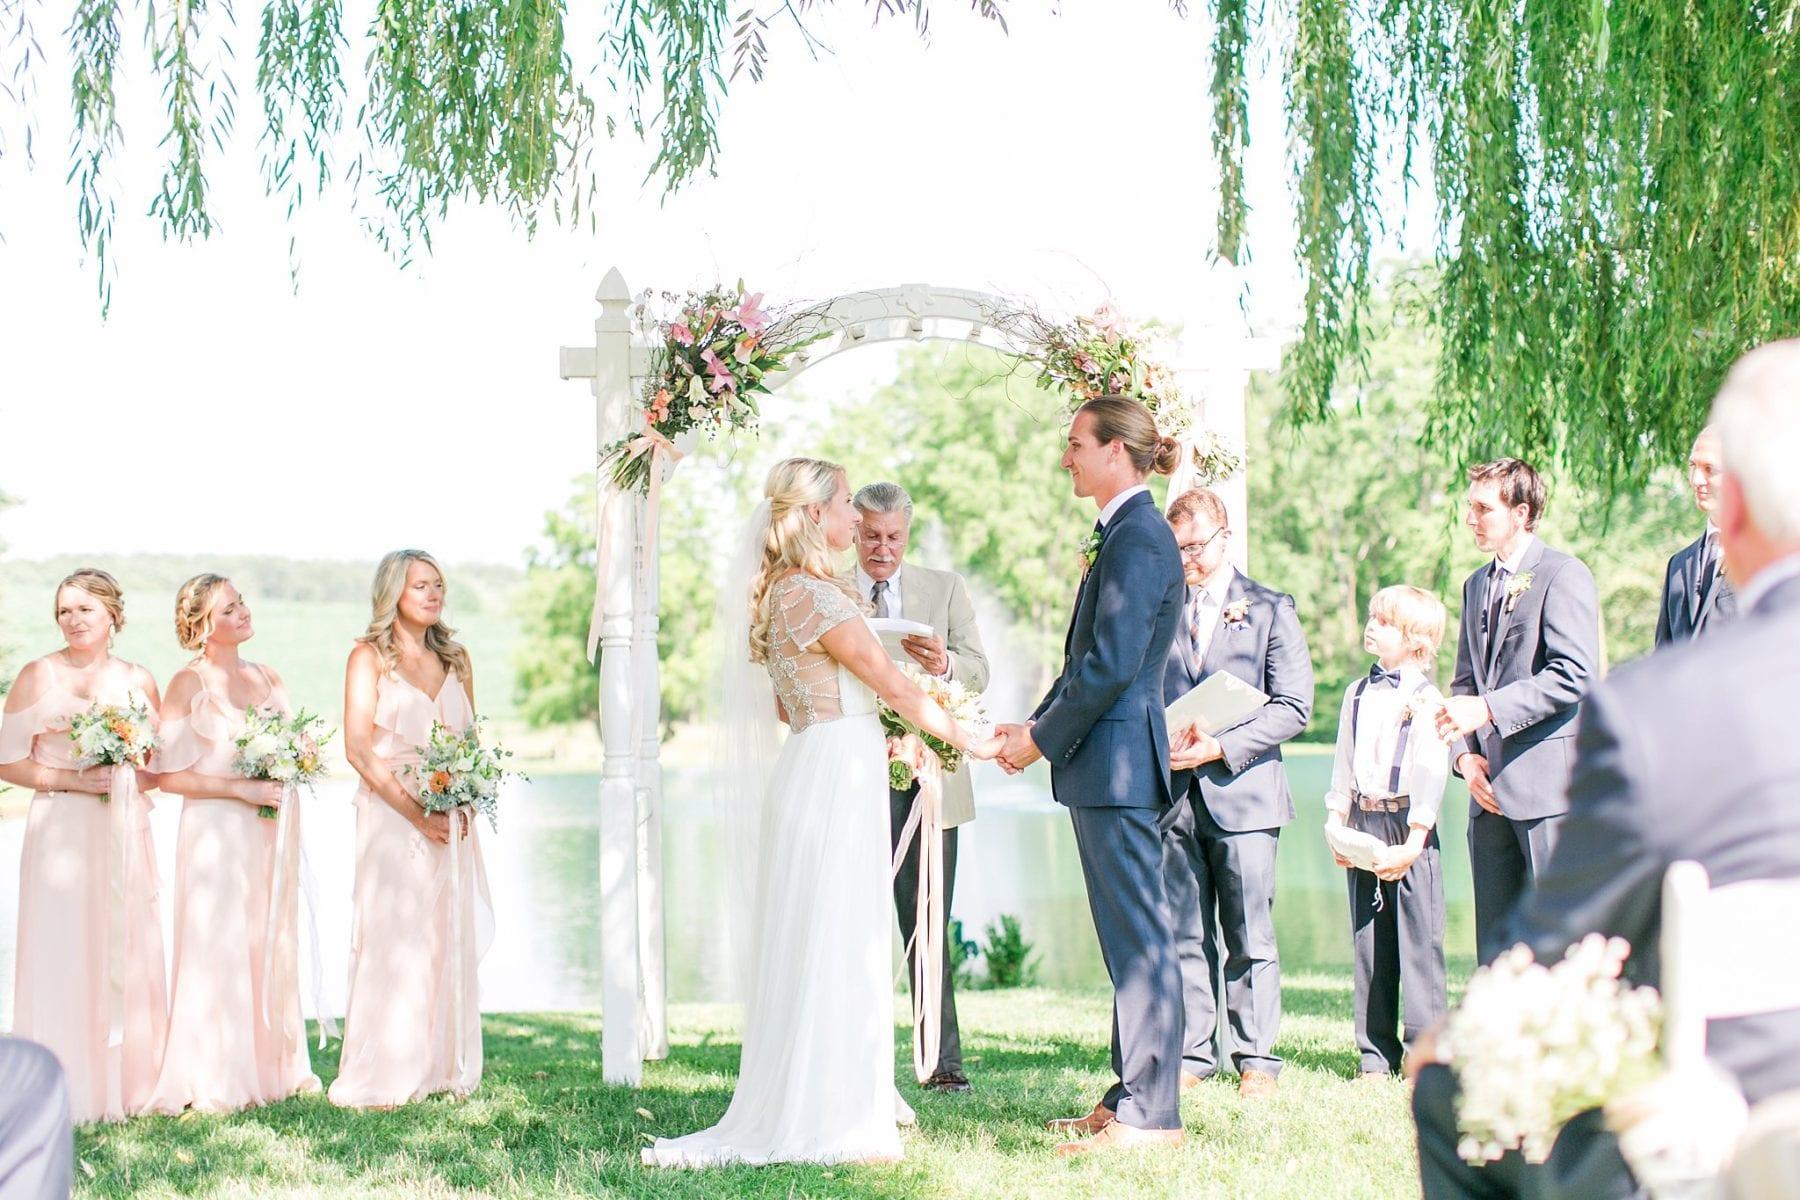 Pond View Farm Wedding Photos Maryland Wedding Photographer Kristen & Ryan Megan Kelsey Photography Blog-121.jpg